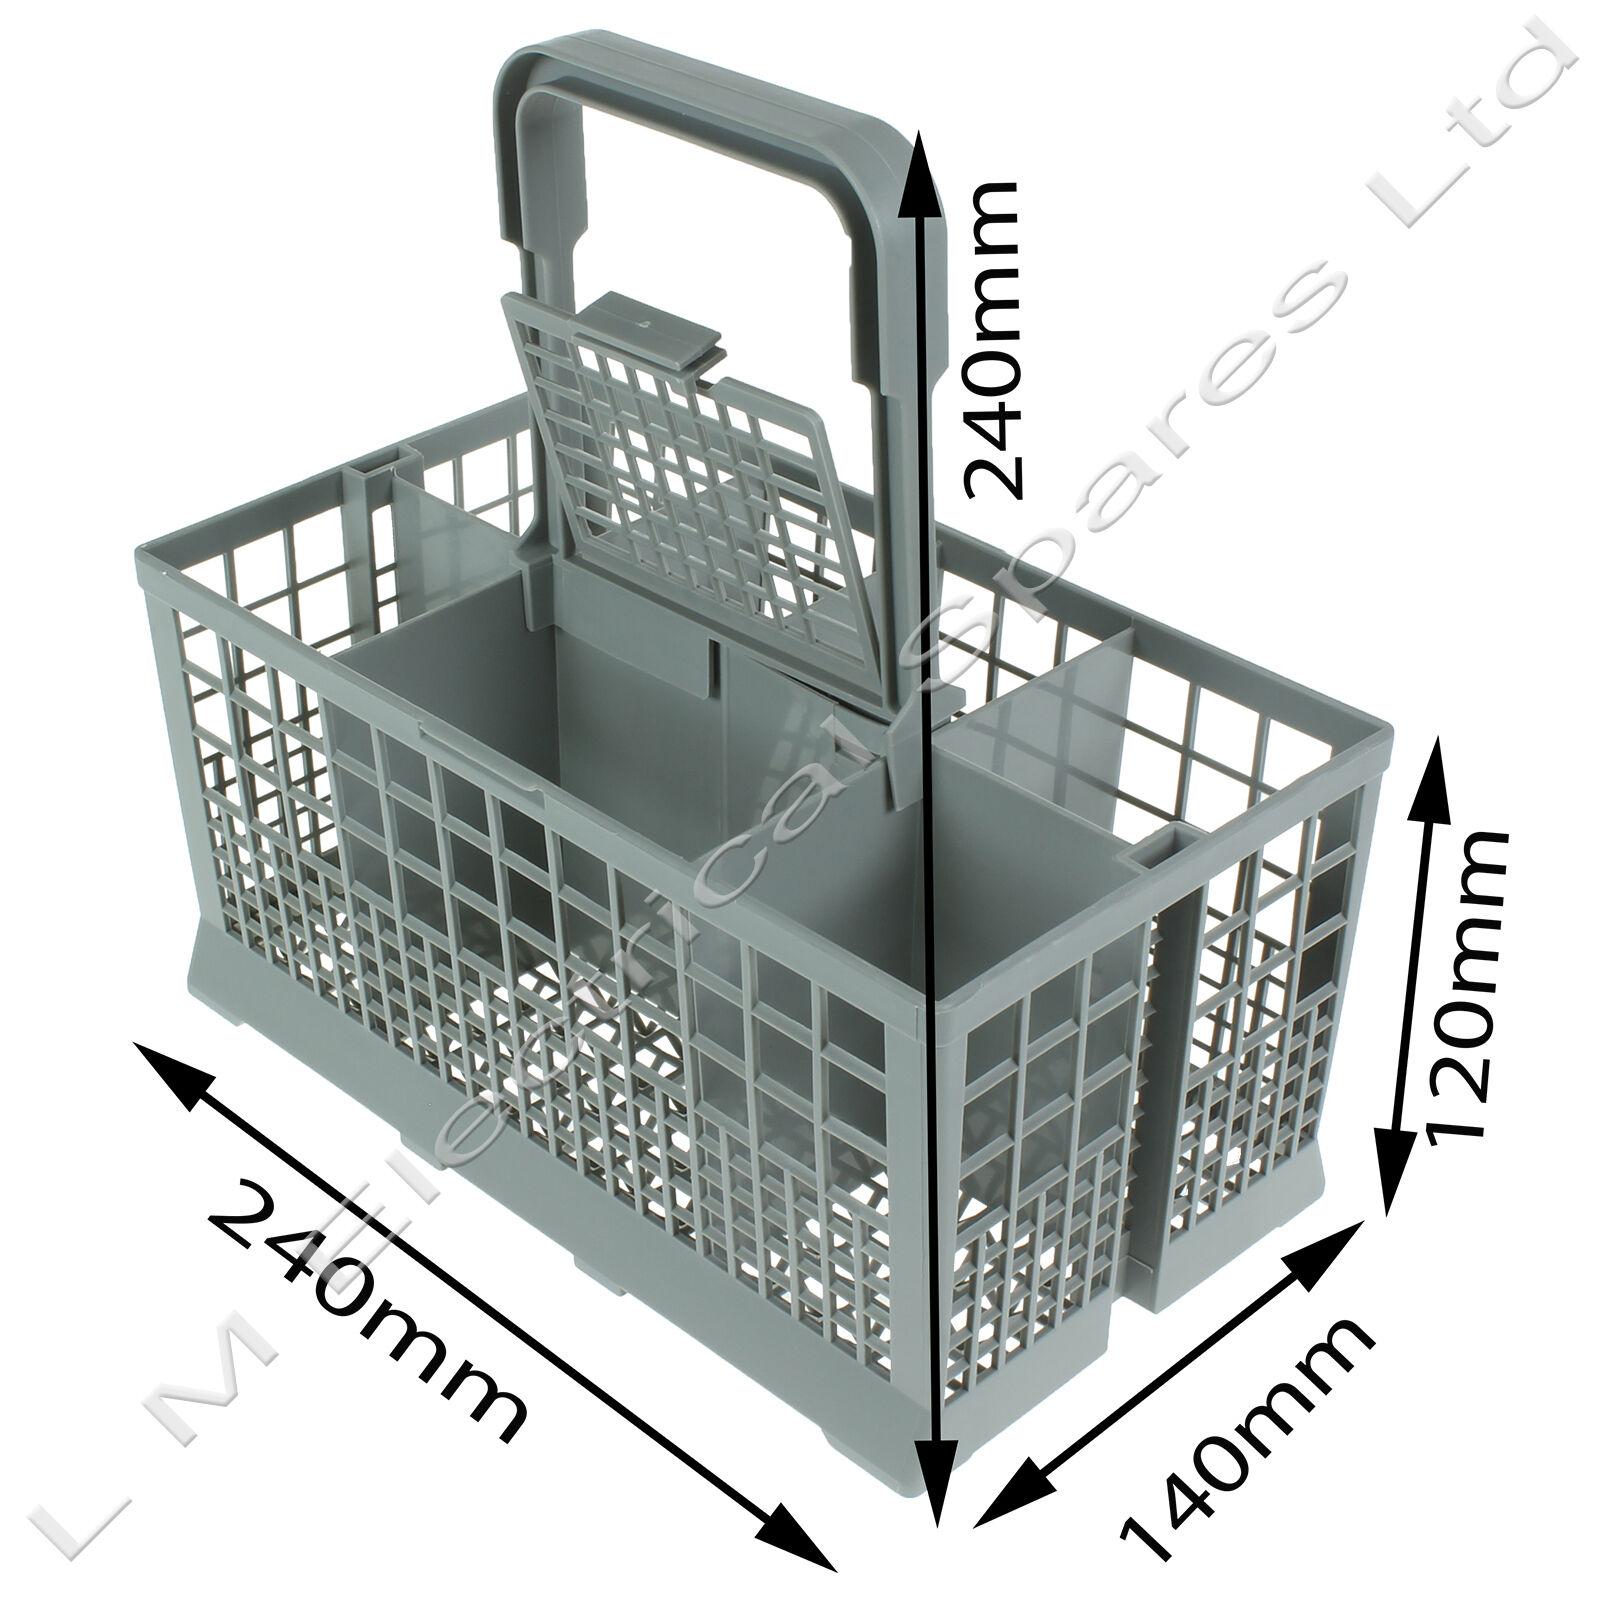 Universal Dishwasher Cutlery Basket for Bosch Neff Hotpoint Siemens Smeg - Gray